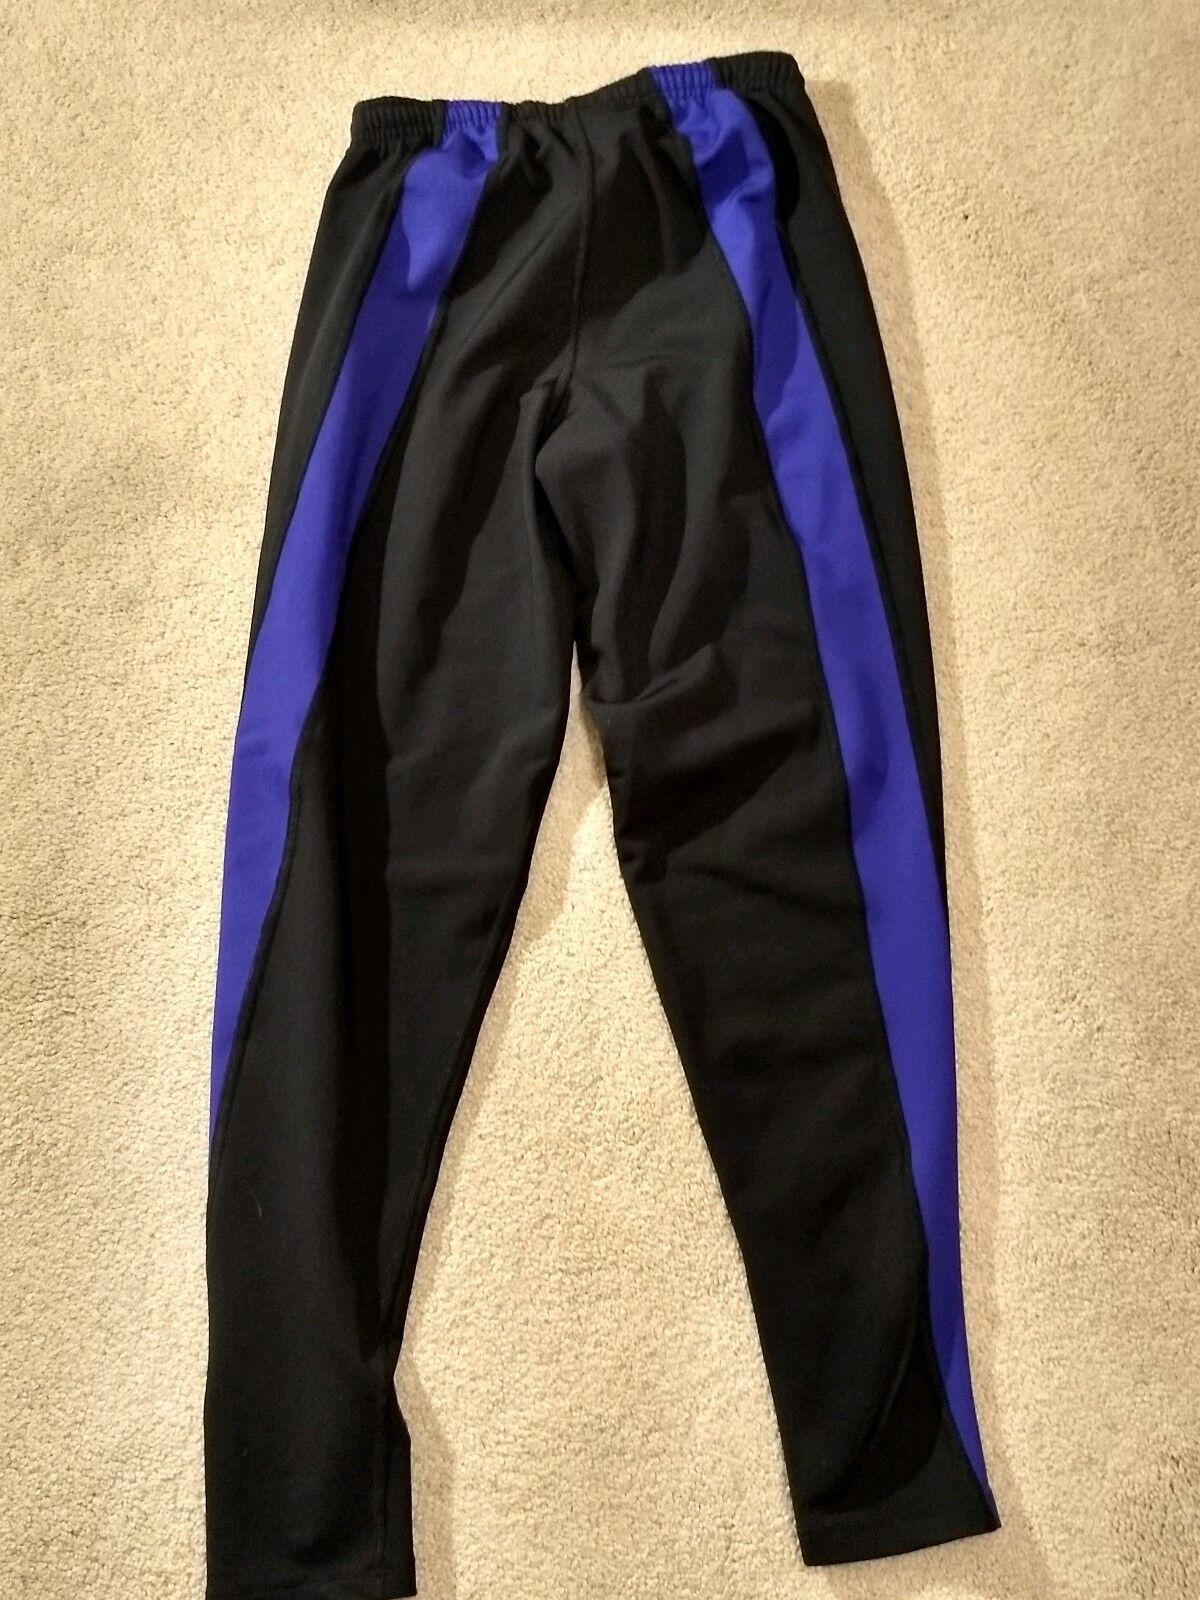 afc083fff6 Vintage Running Leggings Size Size Size XL 767875 - dressstore ...